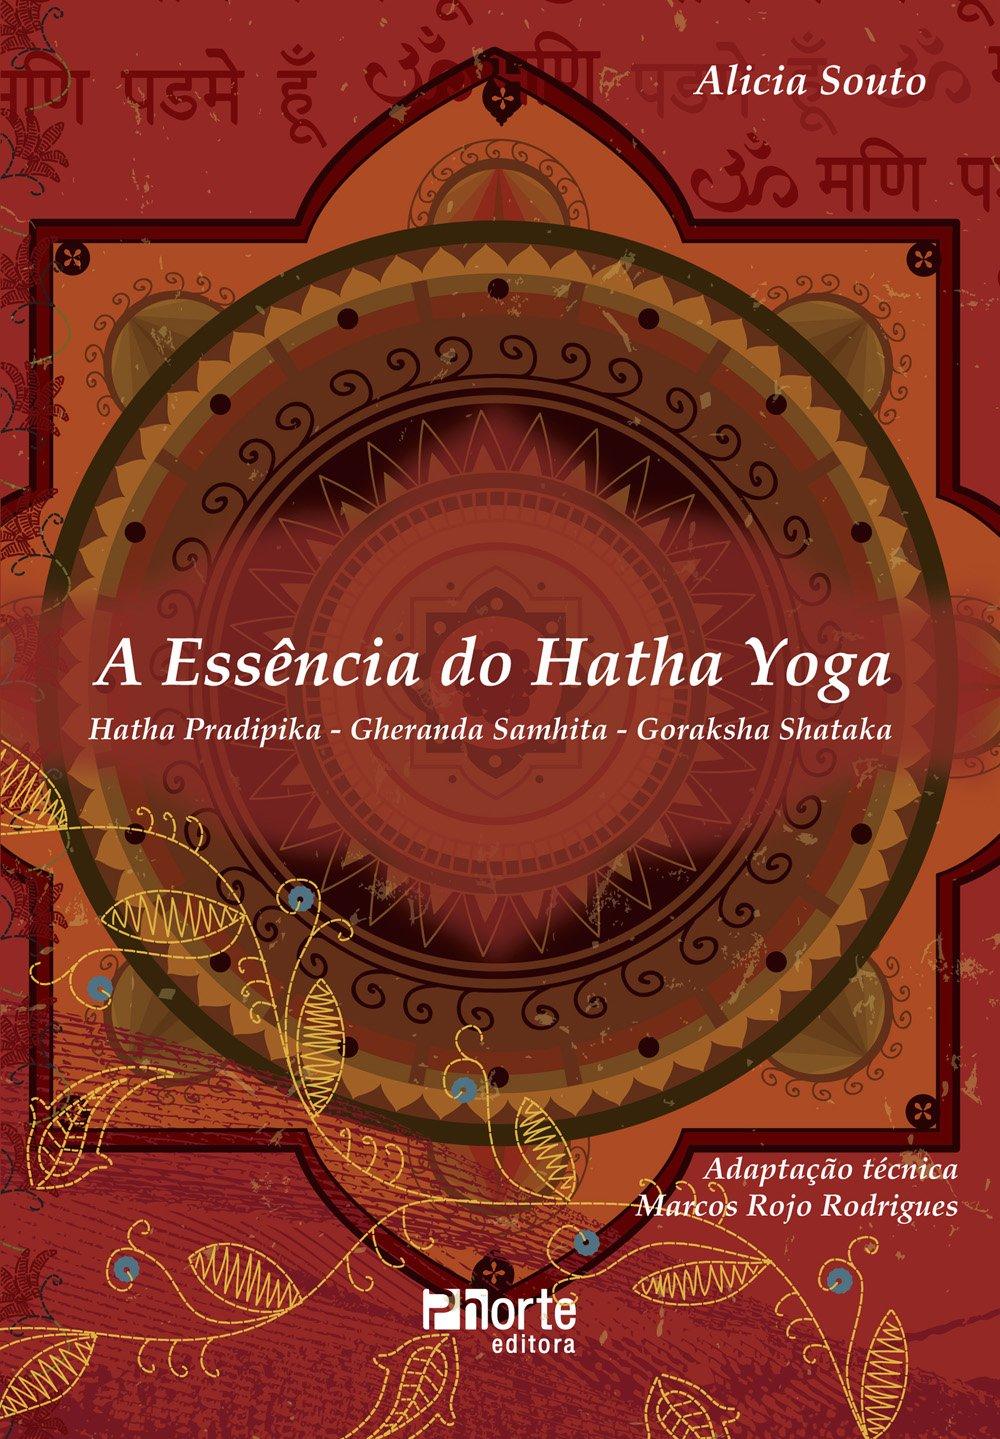 A Essência do Hatha Yoga (Em Portuguese do Brasil): Amazon ...